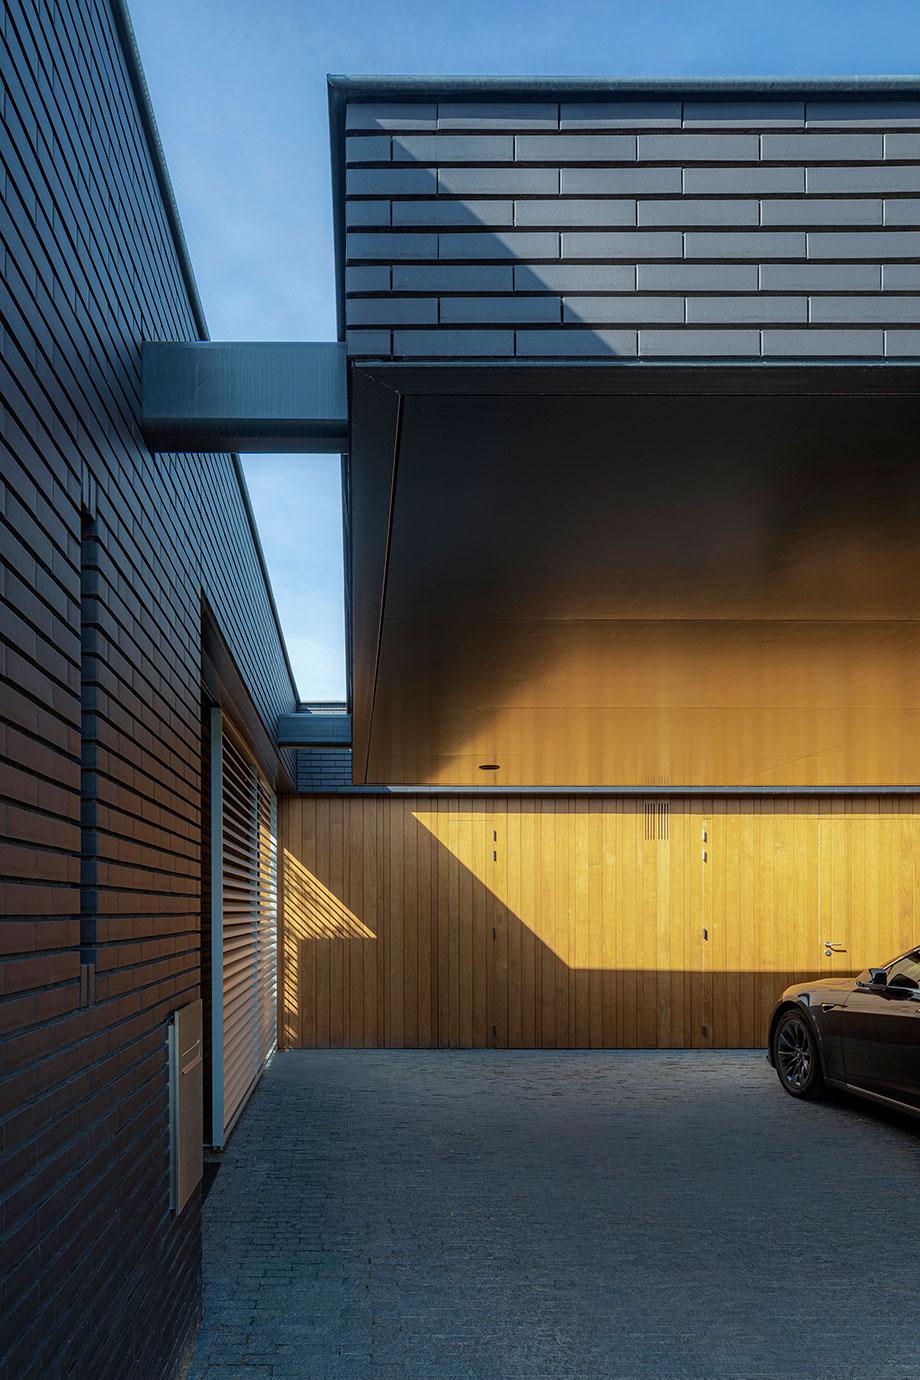 casa de i29 y bedaux de brouwer (1) - foto ewout huibers